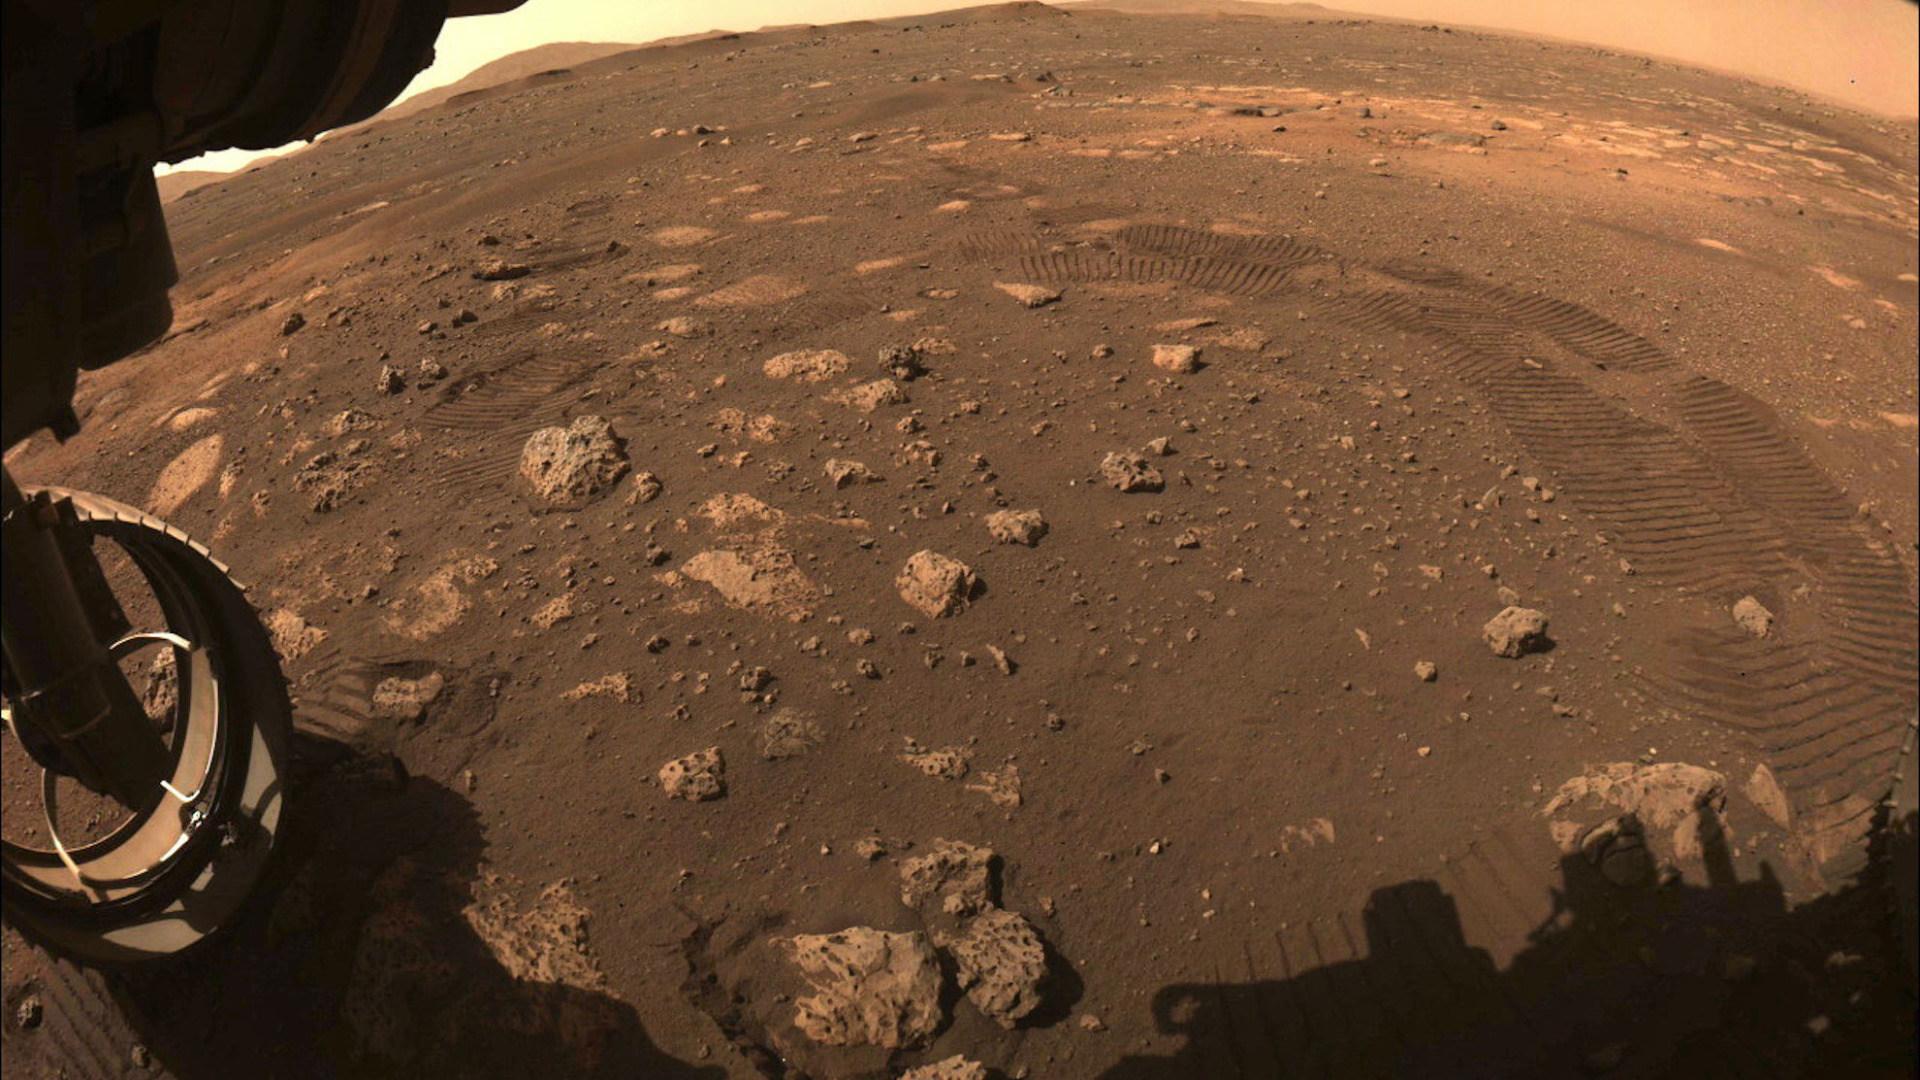 Nasa, Oberfläche, Mars, Aufnahme, Mars-Rover, Perseverance